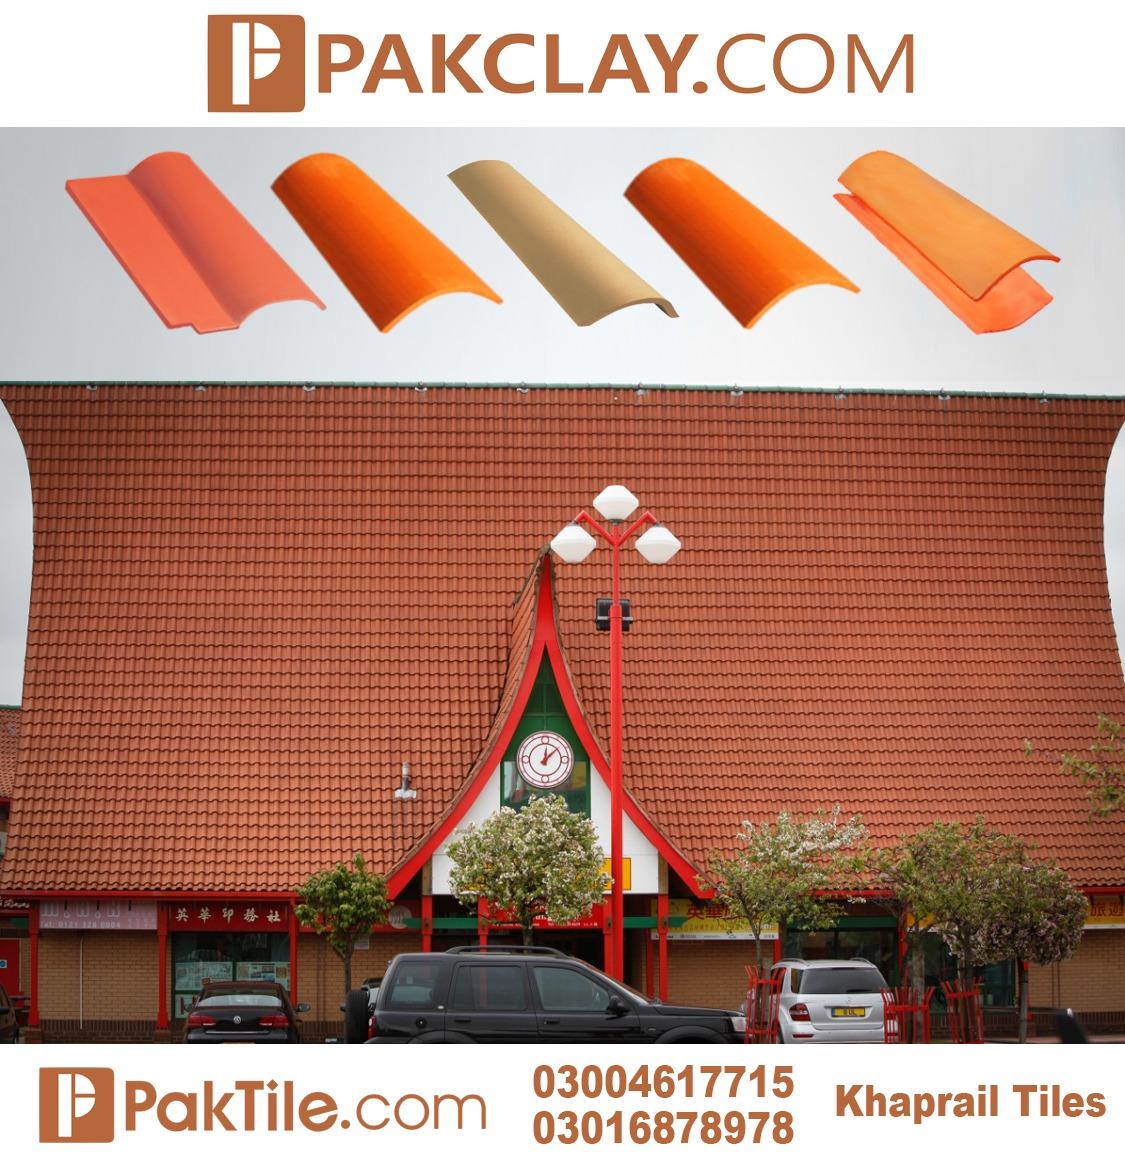 Pak Clay Rate of Khaprail Tiles Company Near Me